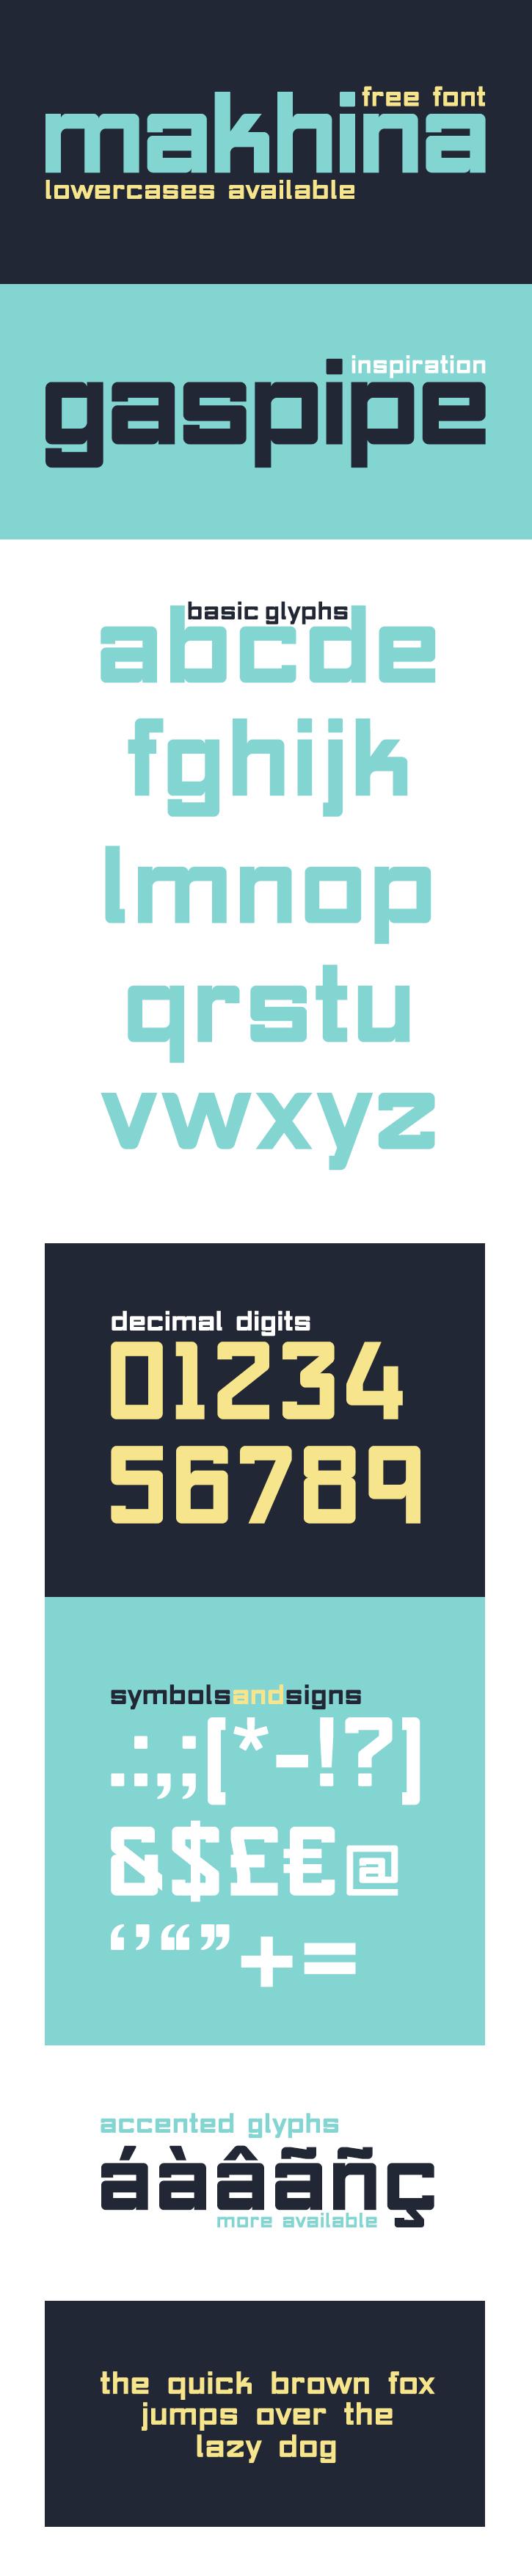 Makhina Free Font by NunoDias